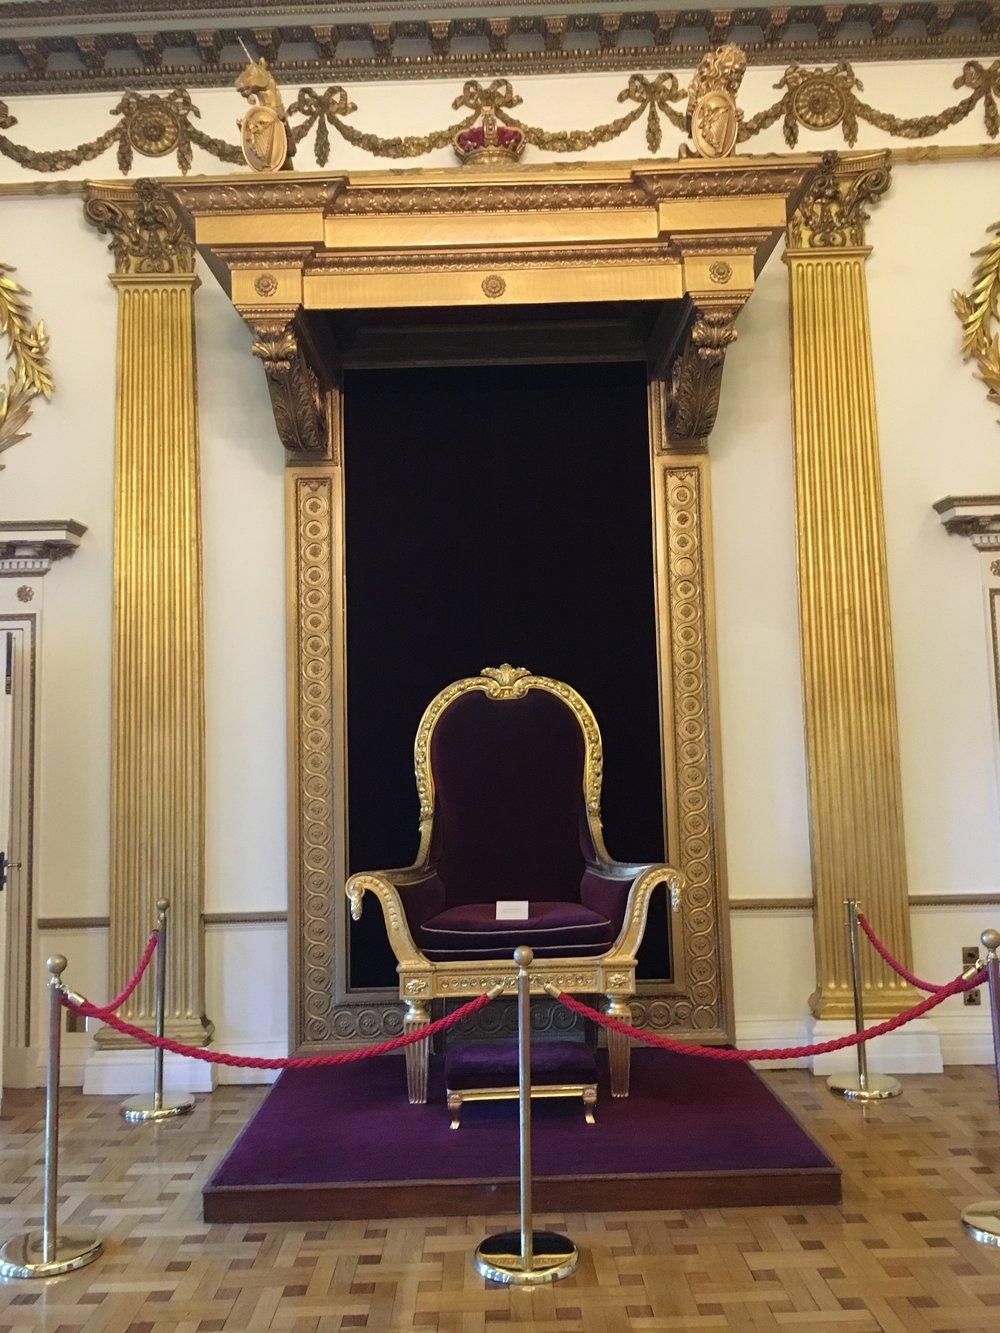 dublin castle; throne; bri rinehart; dublin; ireland